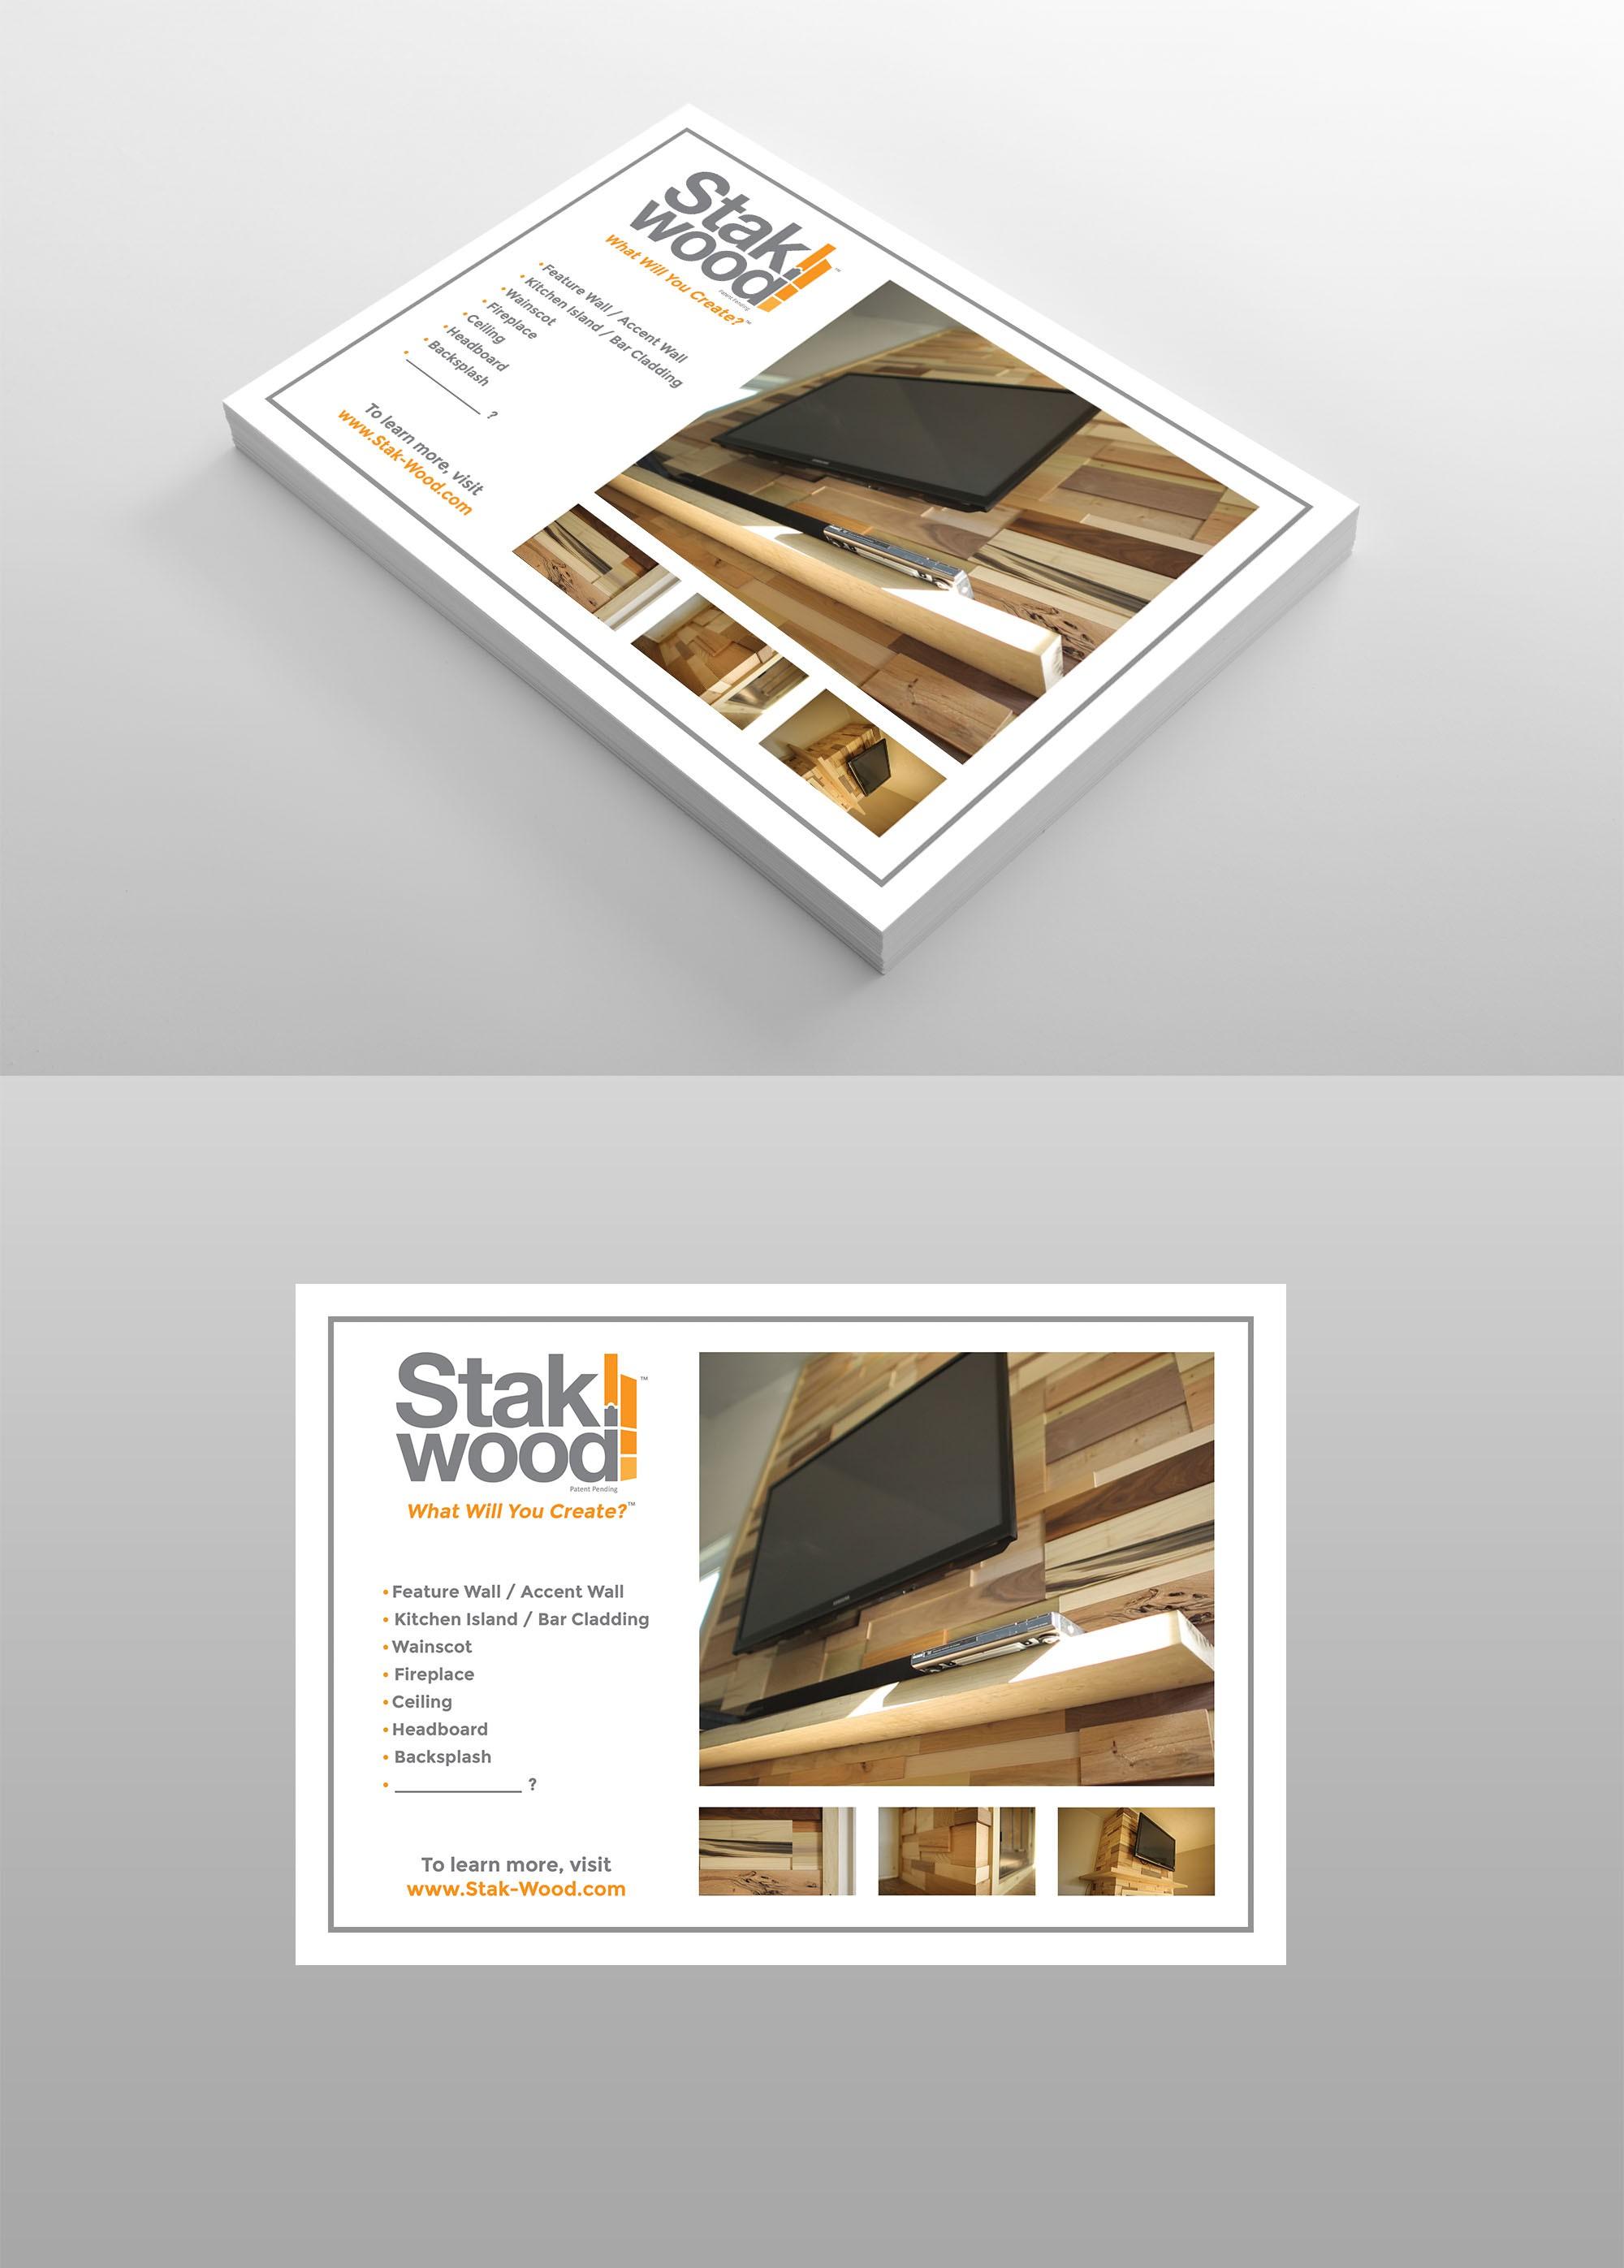 StakWood Sample Box Insert